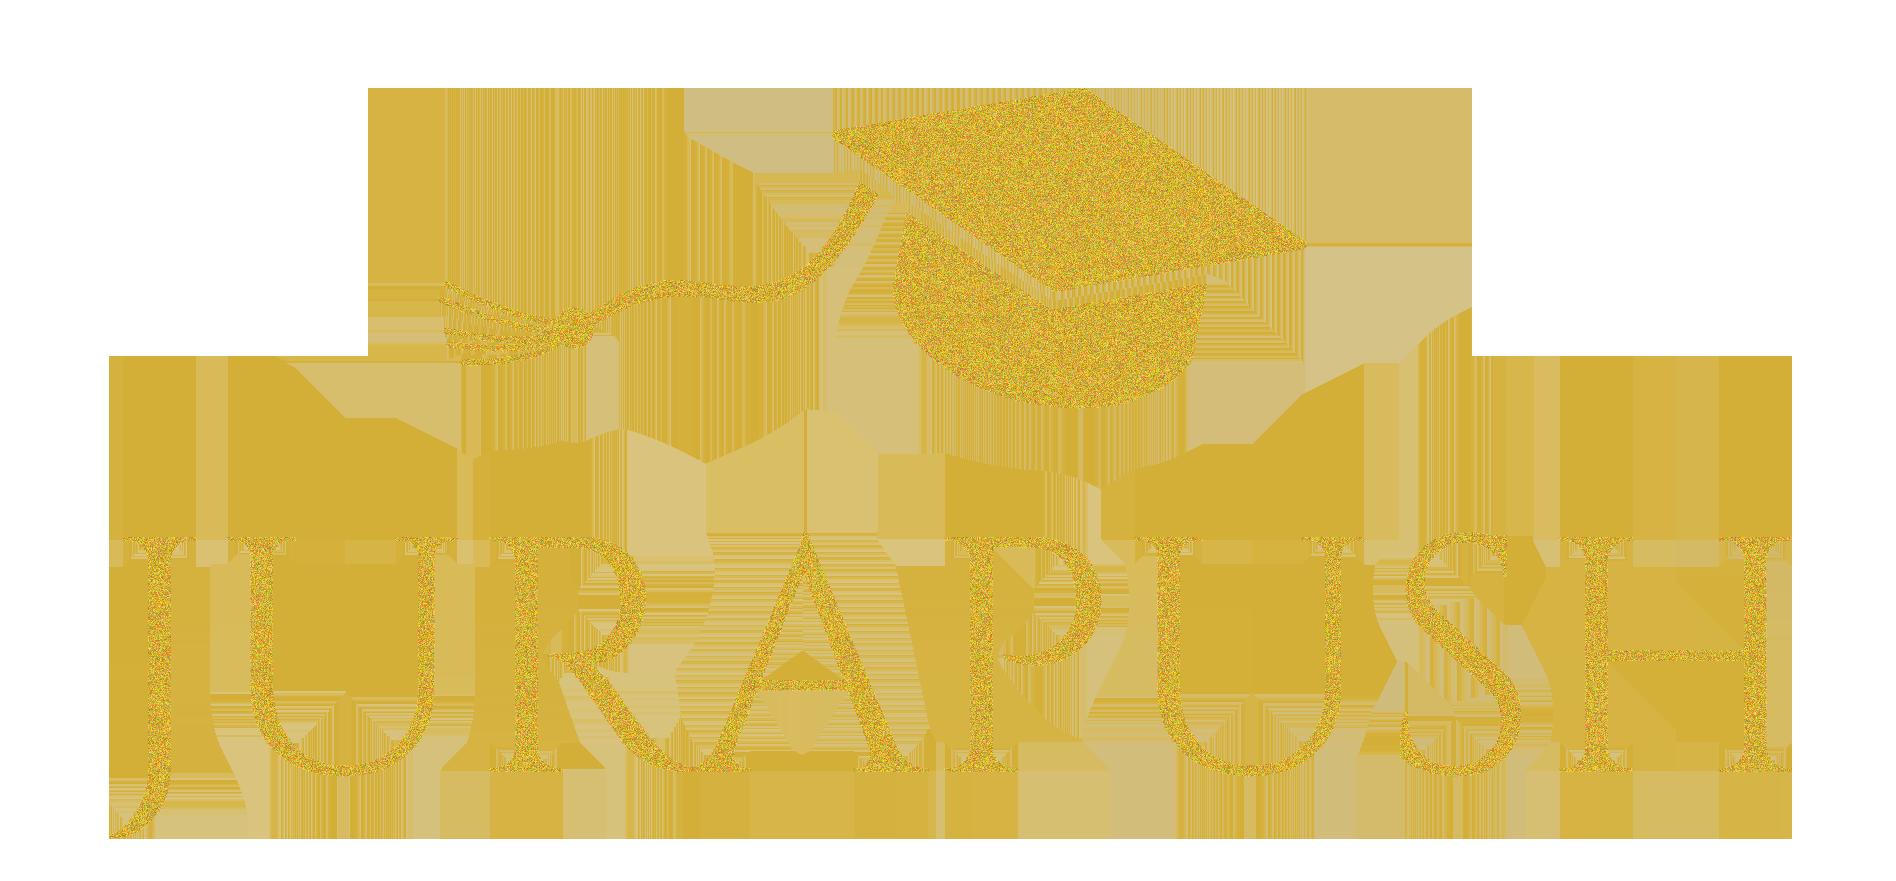 Jurapush - Jura Nachhilfe, Einzelunterricht, Jura Crashkurse, Klausurenkurse.